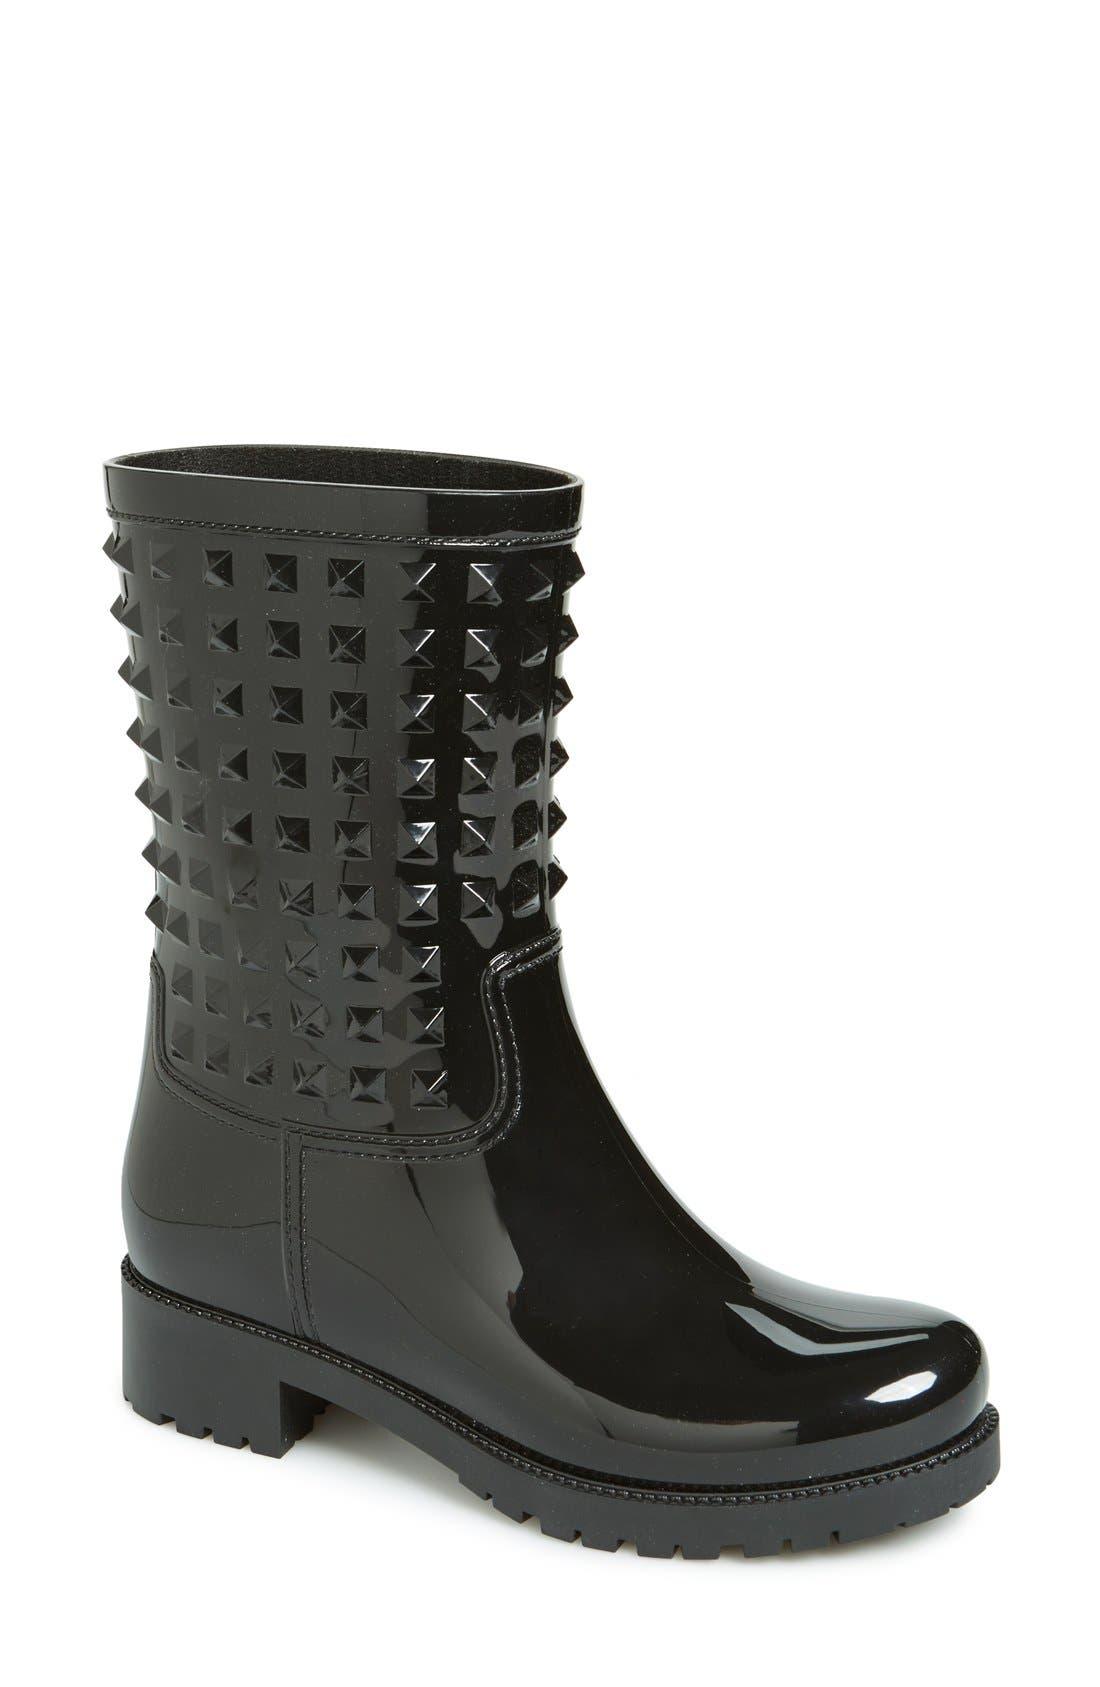 Alternate Image 1 Selected - Valentino 'Rockstud' Rain Boot (Women)